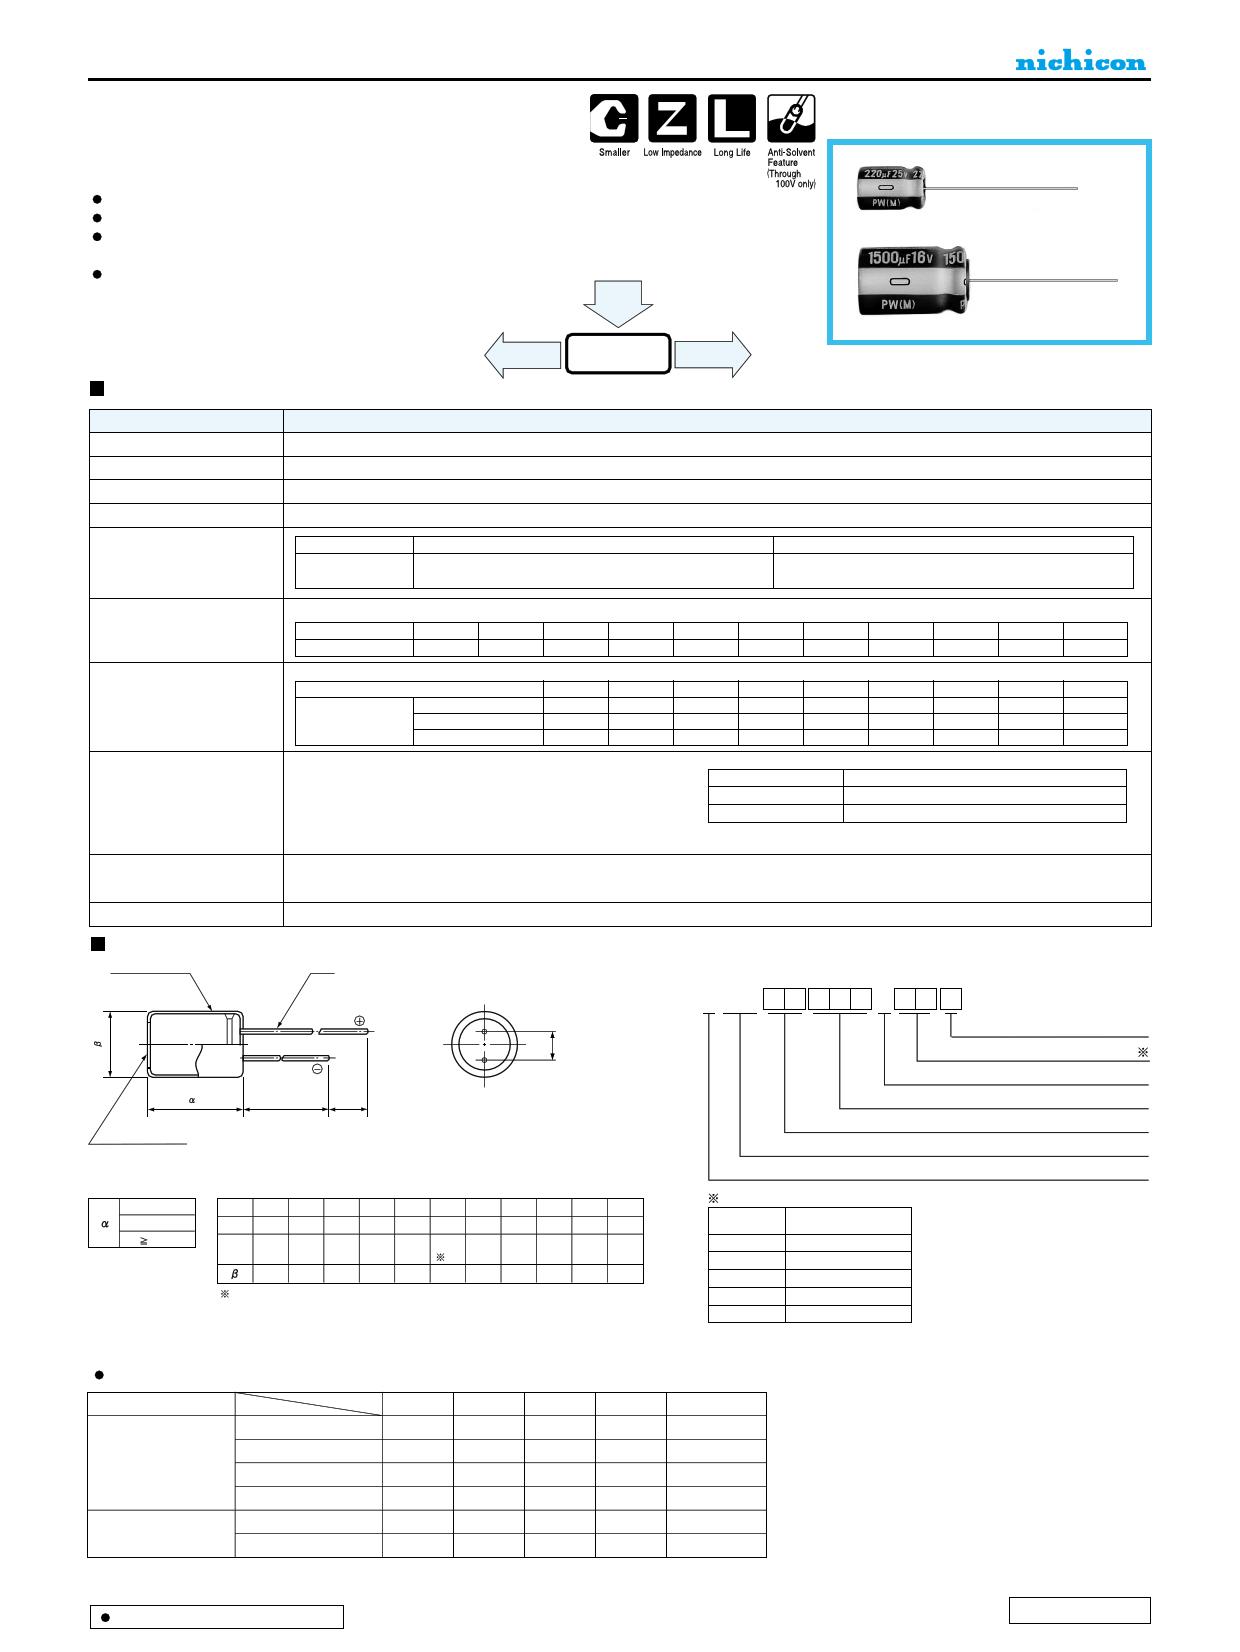 UPW2A100MED 데이터시트 및 UPW2A100MED PDF